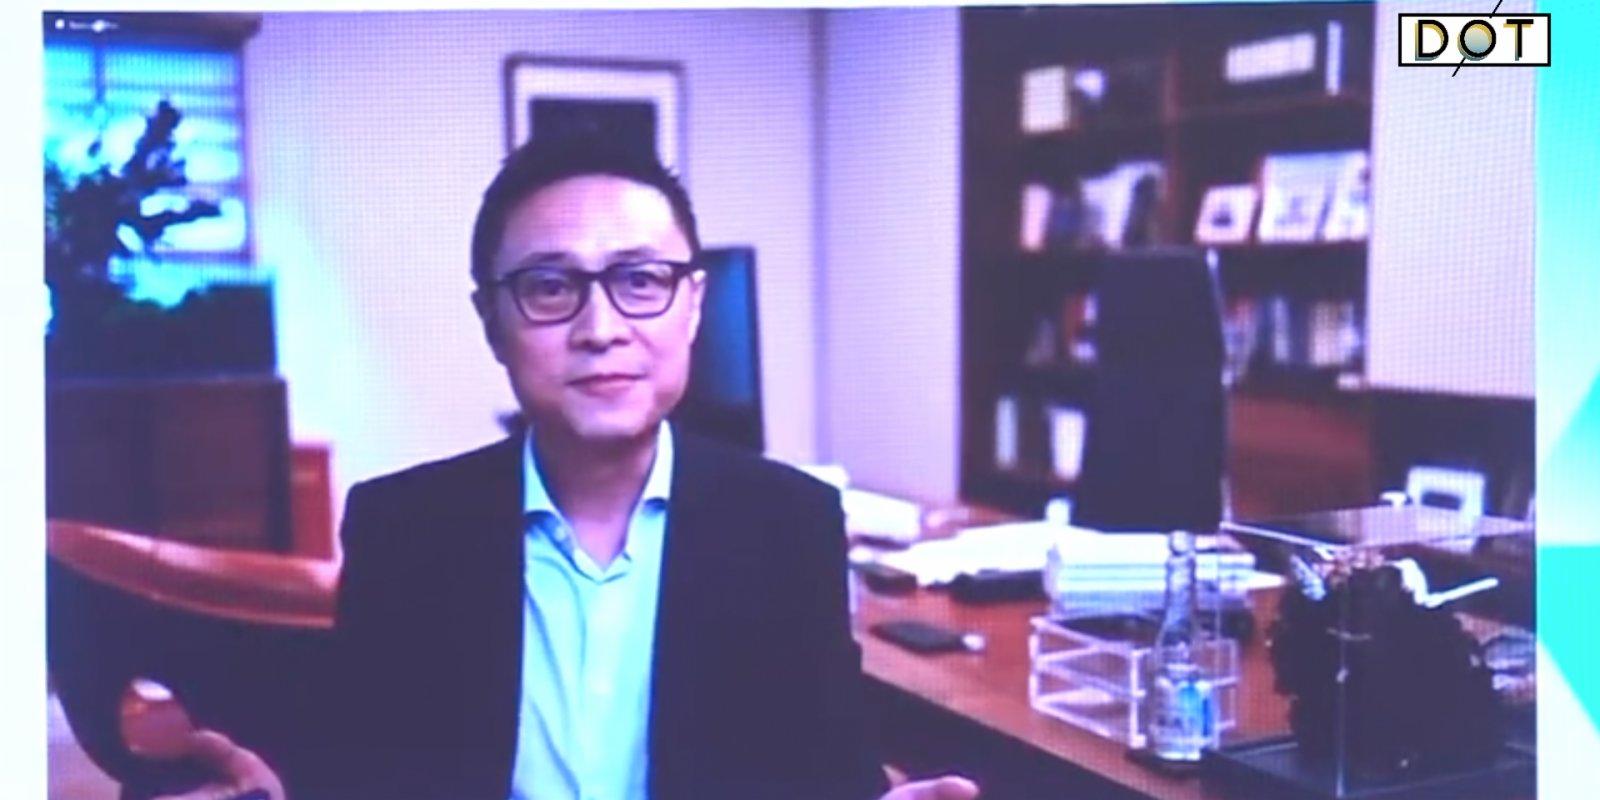 Watch This | 'Western media have preset wrong narrative about China': Eric Xun Li